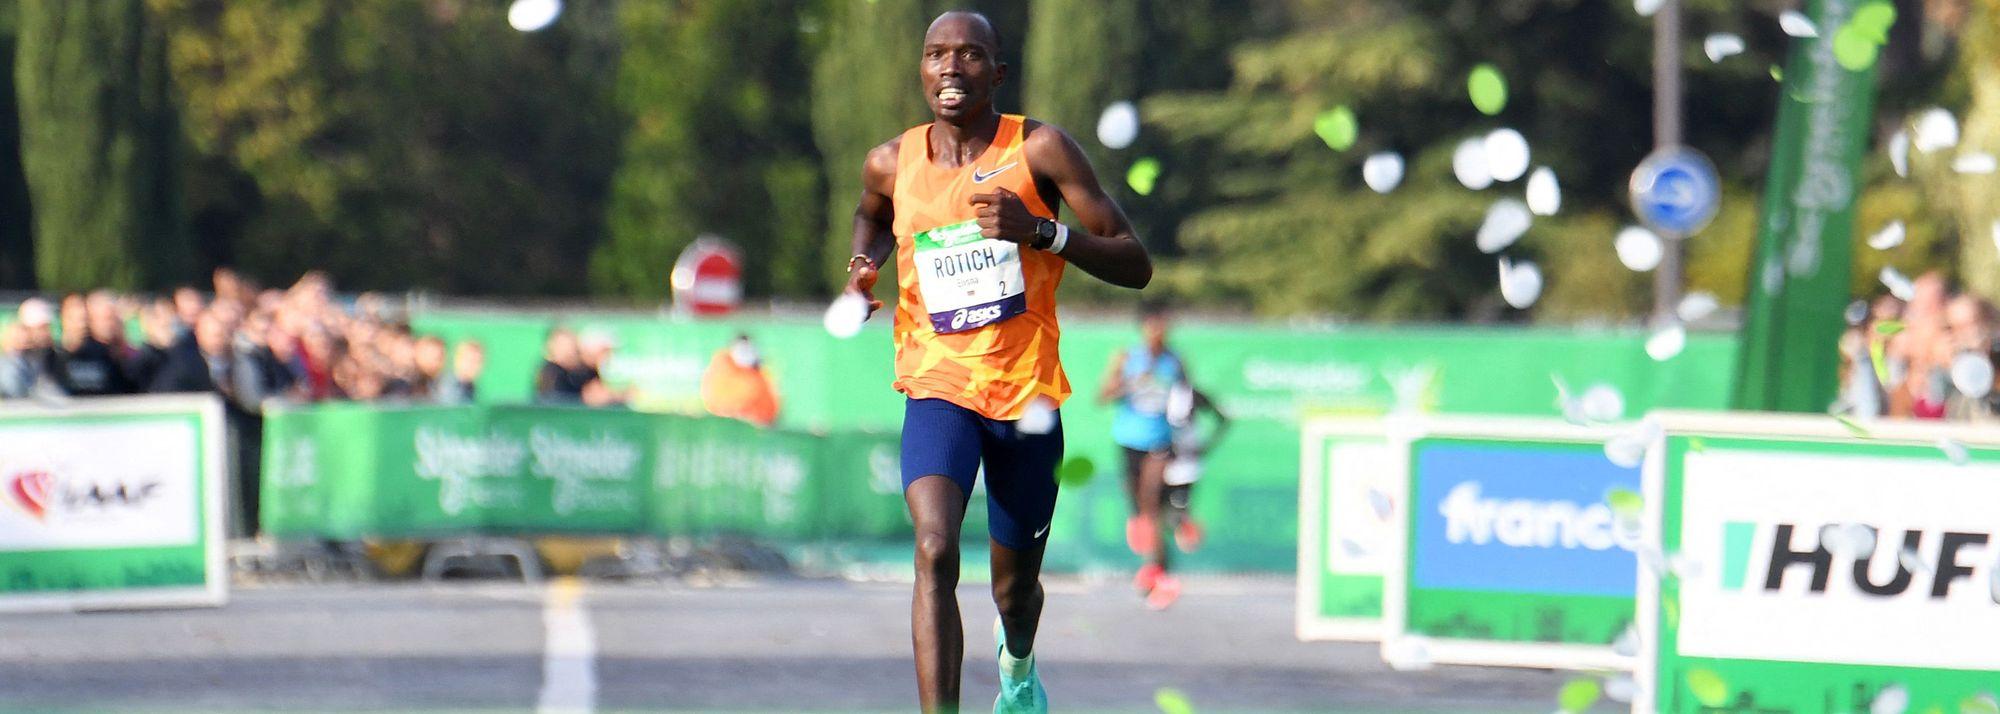 Course records for Elisha Rotich at the Paris Marathon and Joyce Tele Chepkemoi at the Rome-Ostia Half Marathon